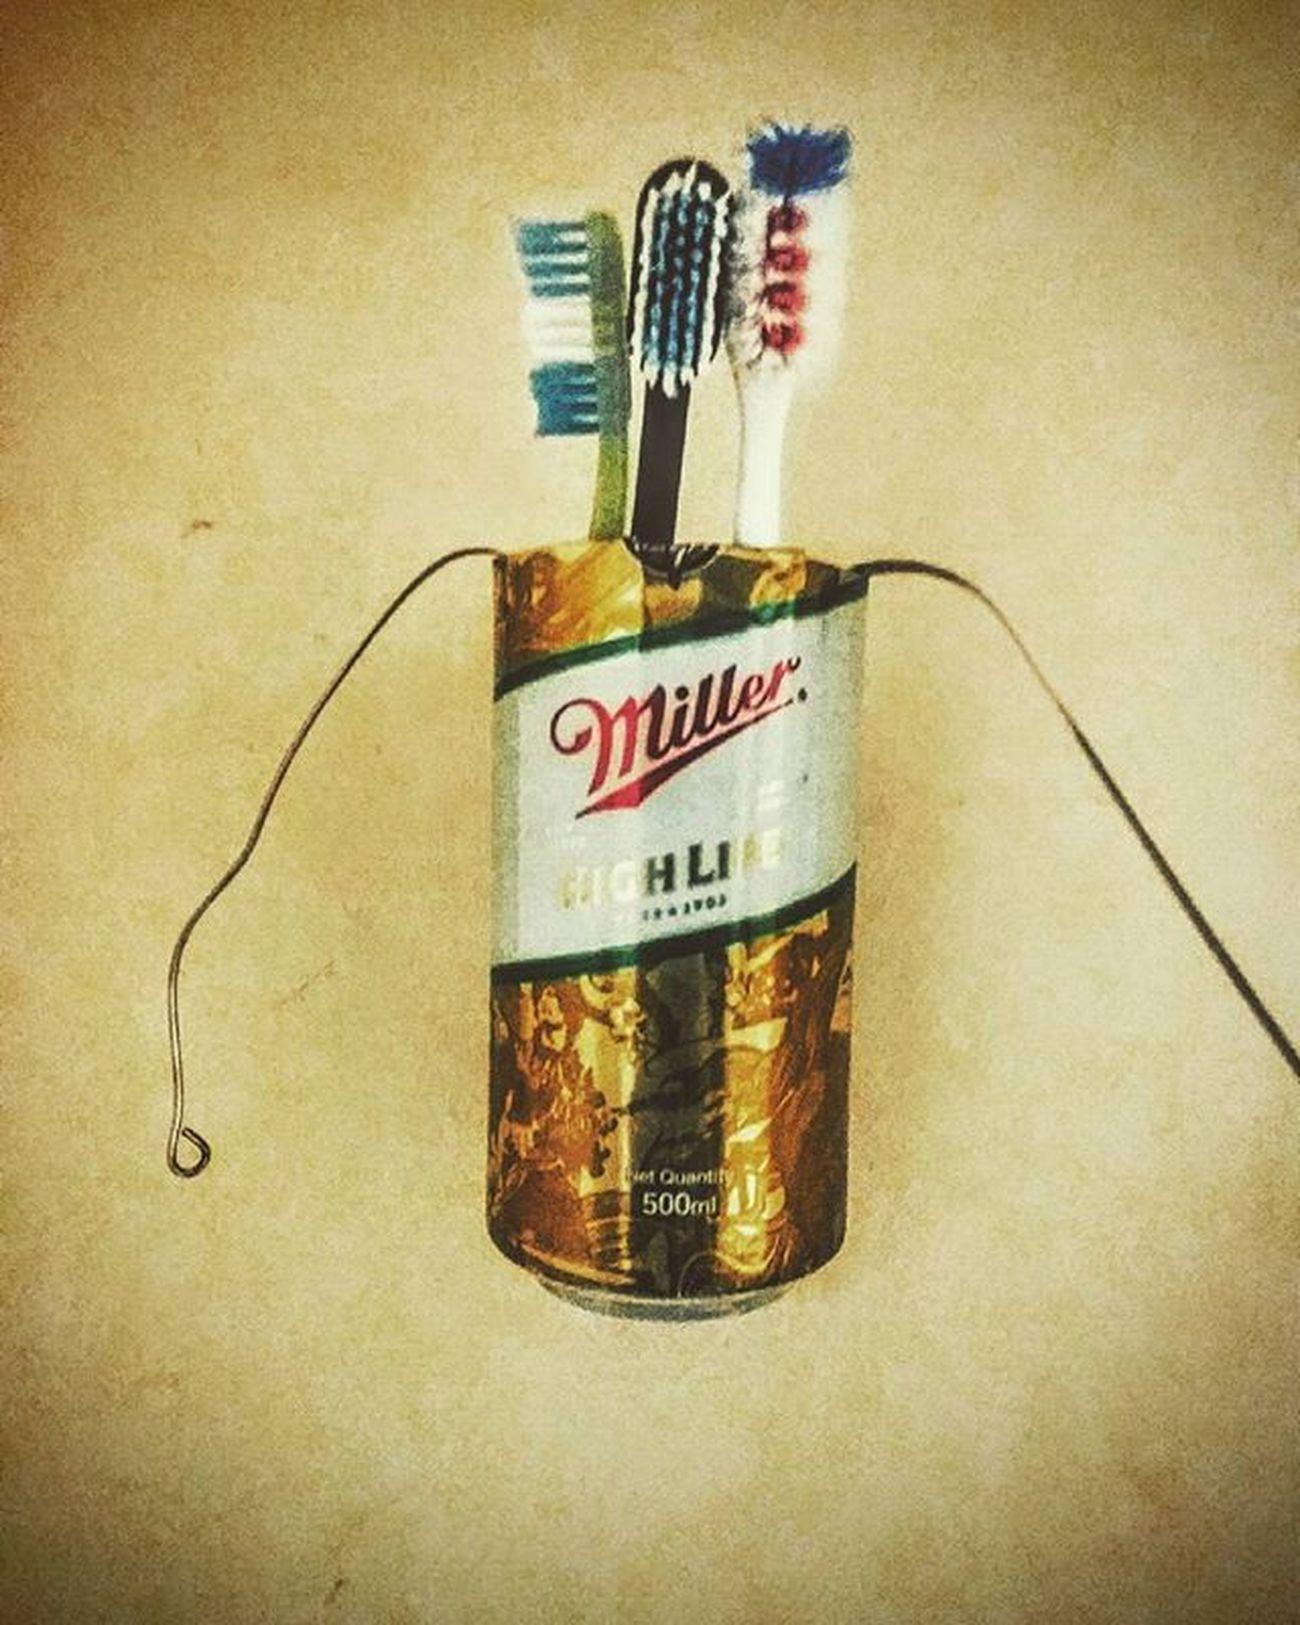 Royal brush case 😎😆 Jugad Savingmoney💰✌ Miller🍺 Motovational😜 Instadailyphoto Uses_as_glass_mug_ashtray_container etc etc 😆😆😉 Oh yeah..